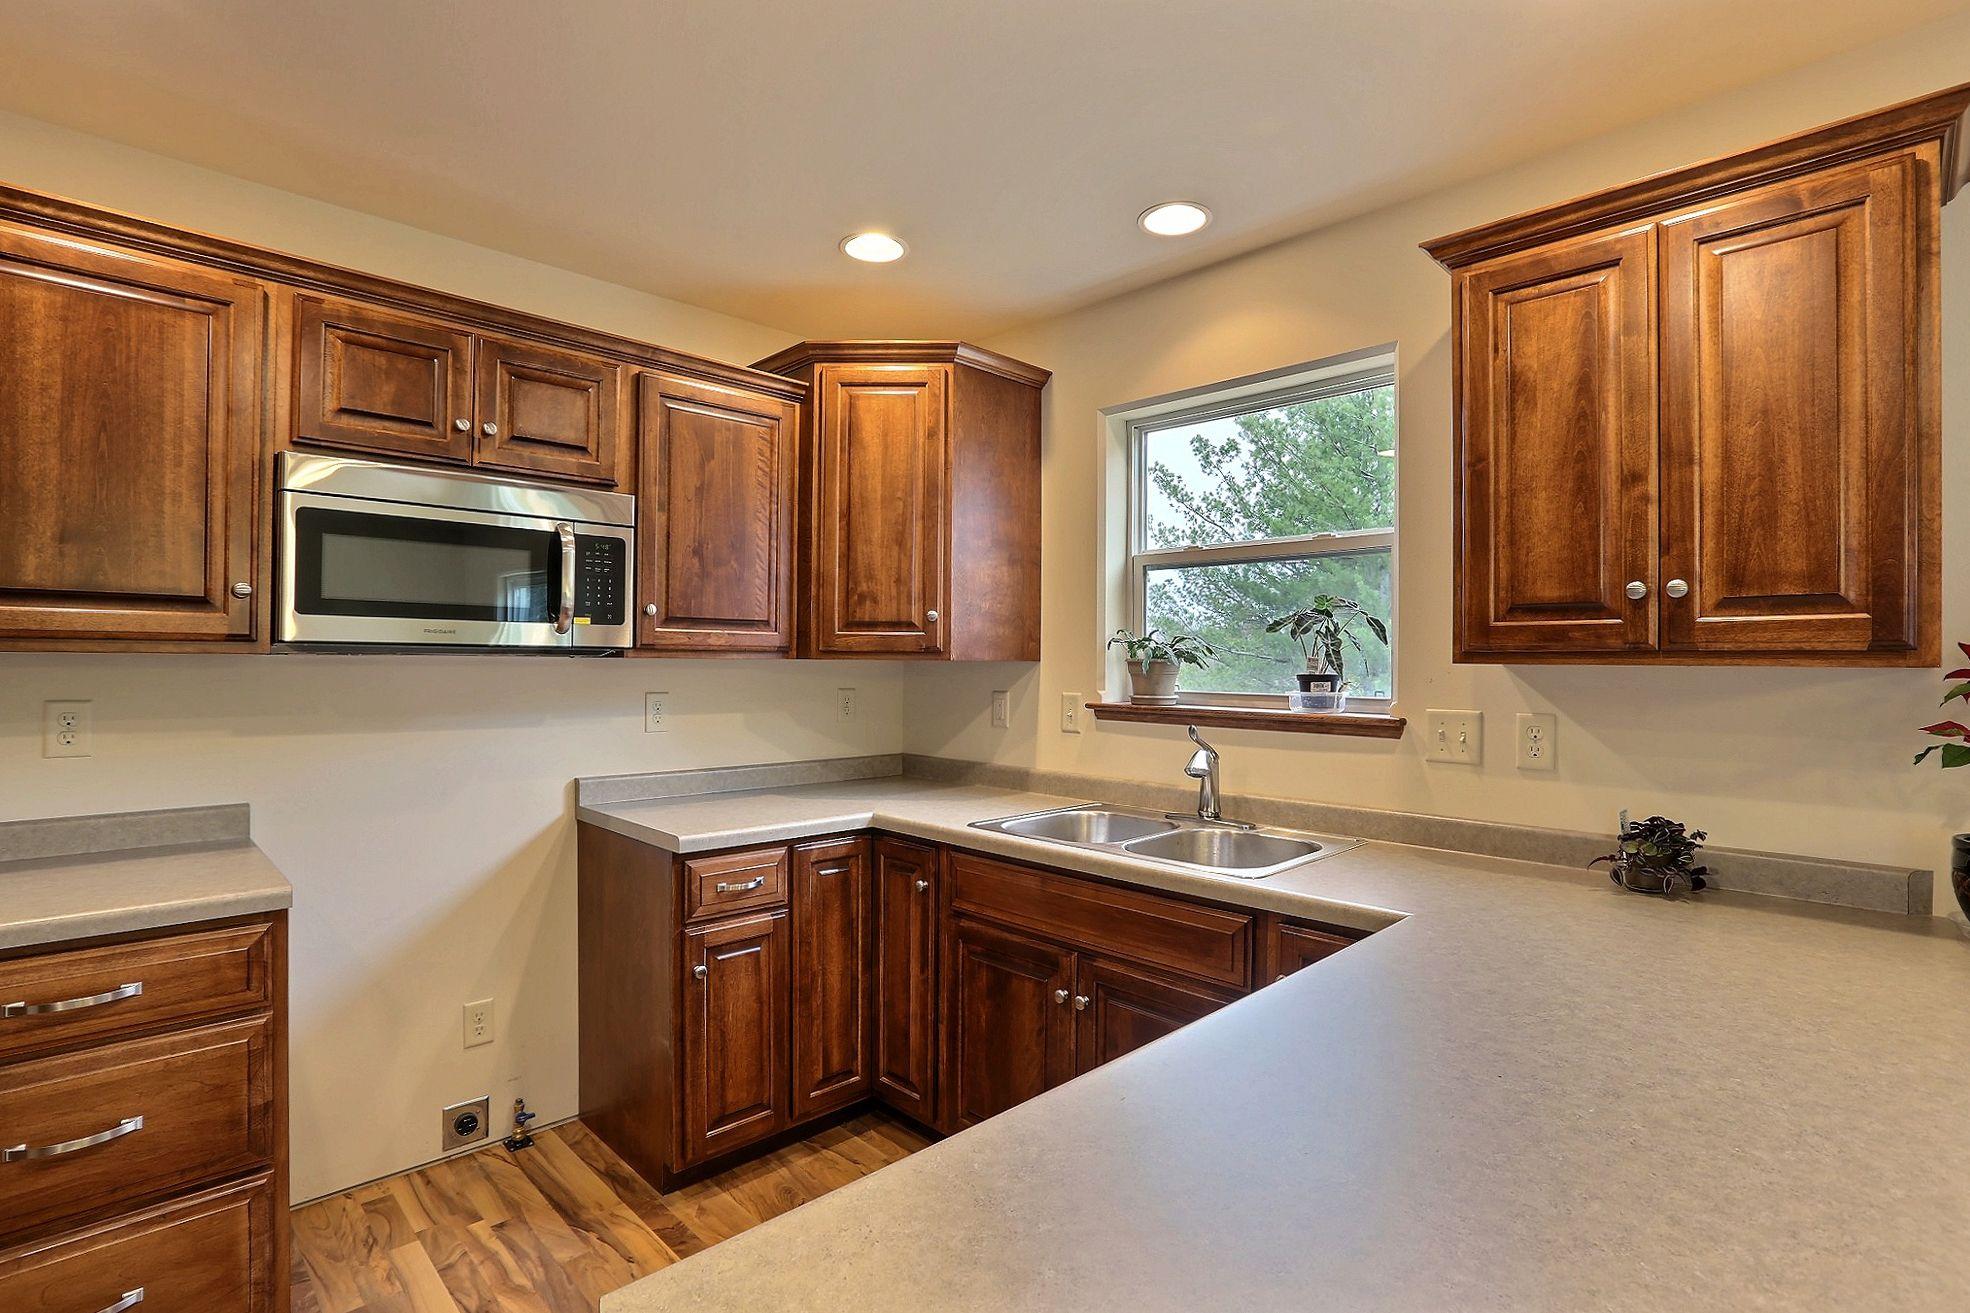 Kitchen - Mocha Floorplan Counter tops: Formica Butterum ...